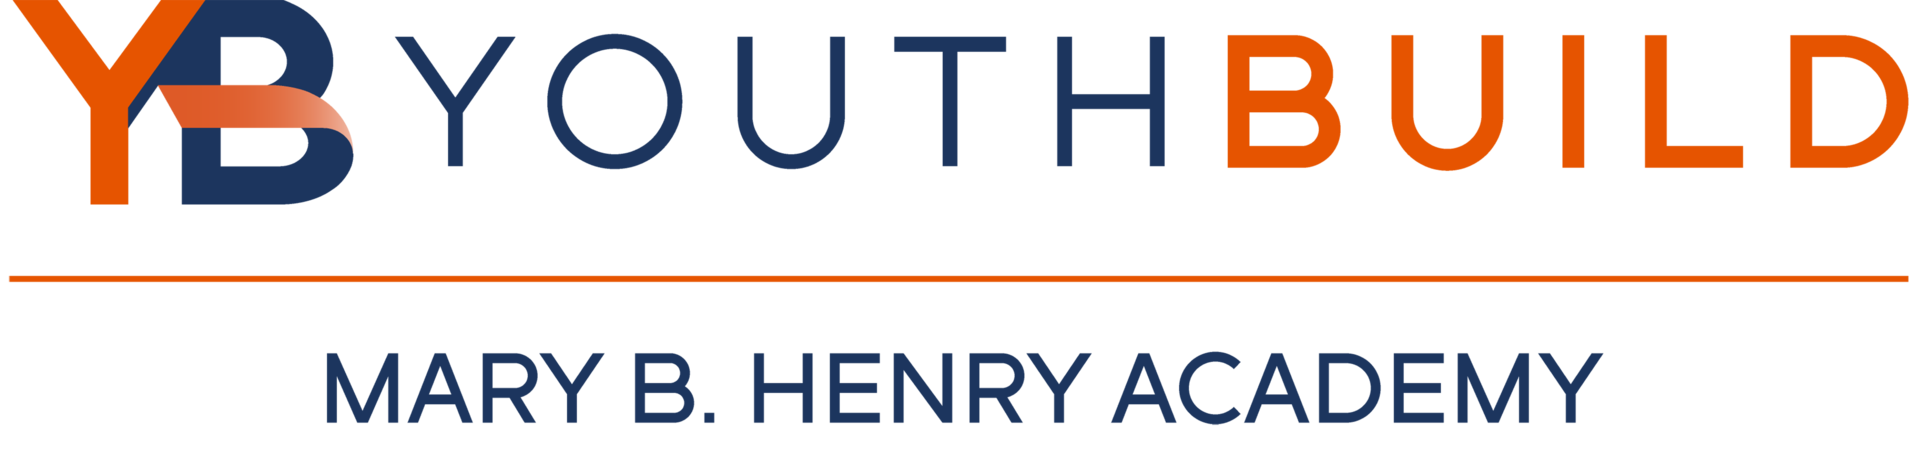 Mary B Henry Academy logo